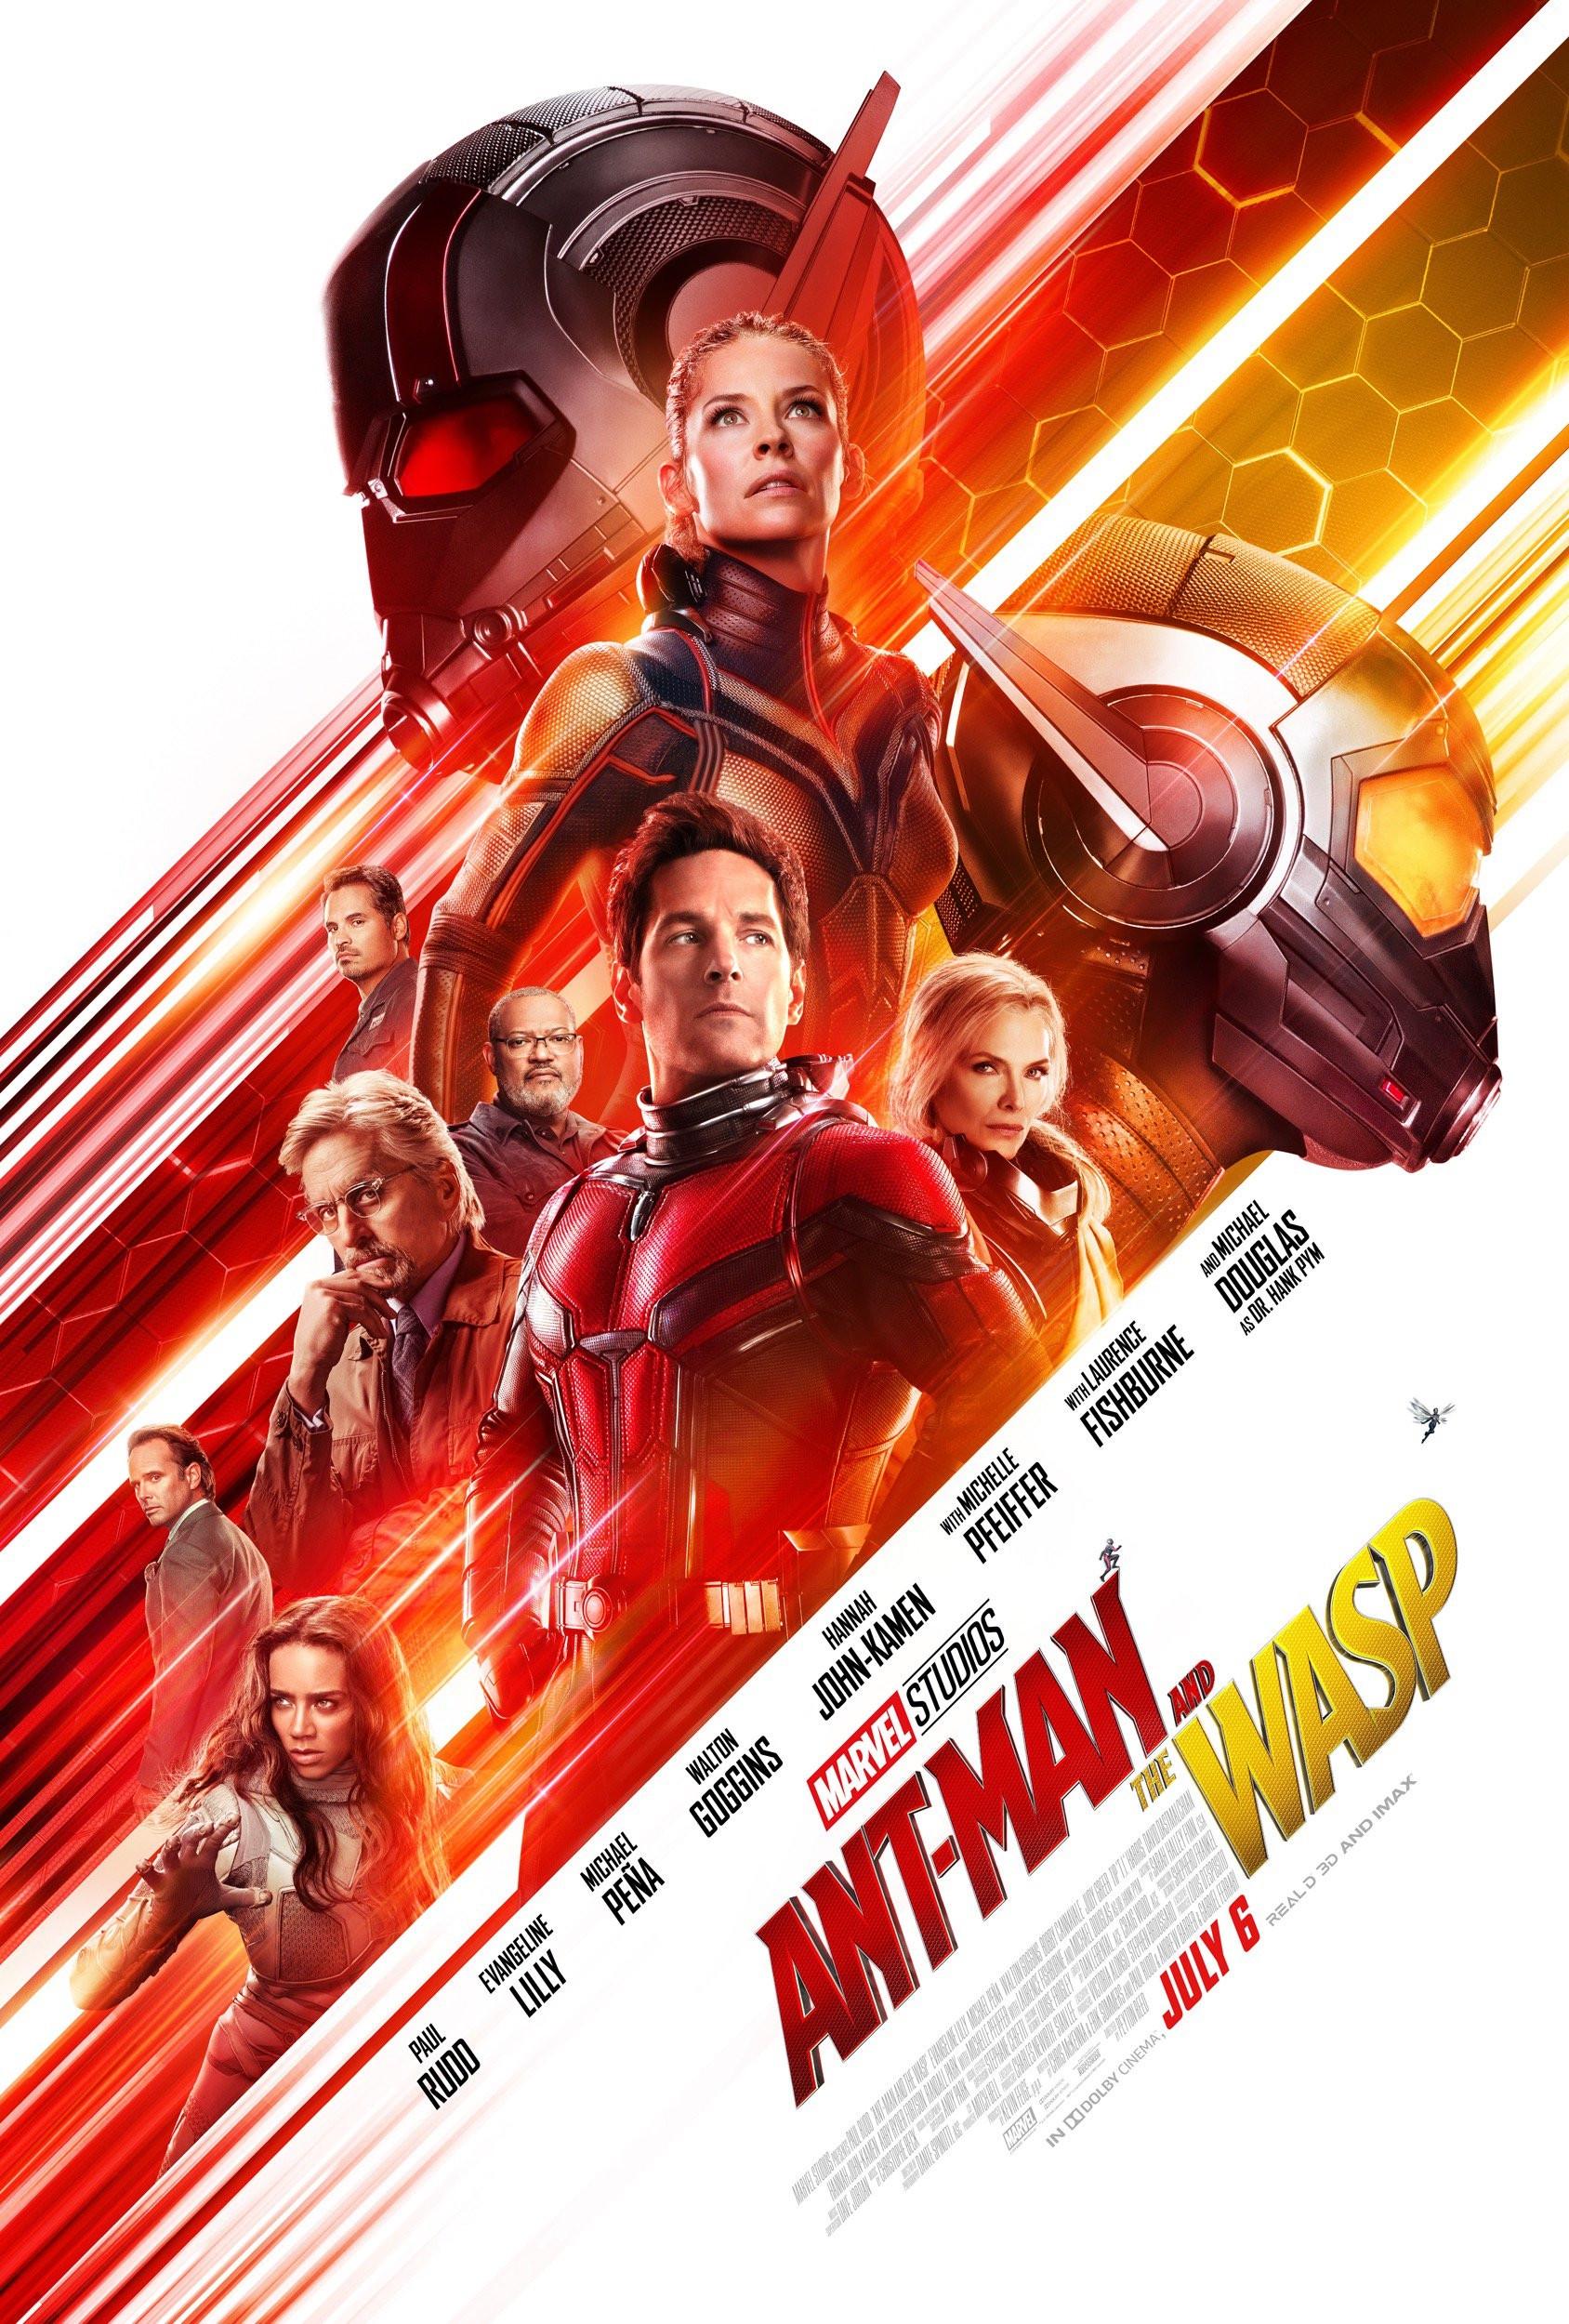 Ausmalbilder Captain America Neu Ant Man and the Wasp Das Bild